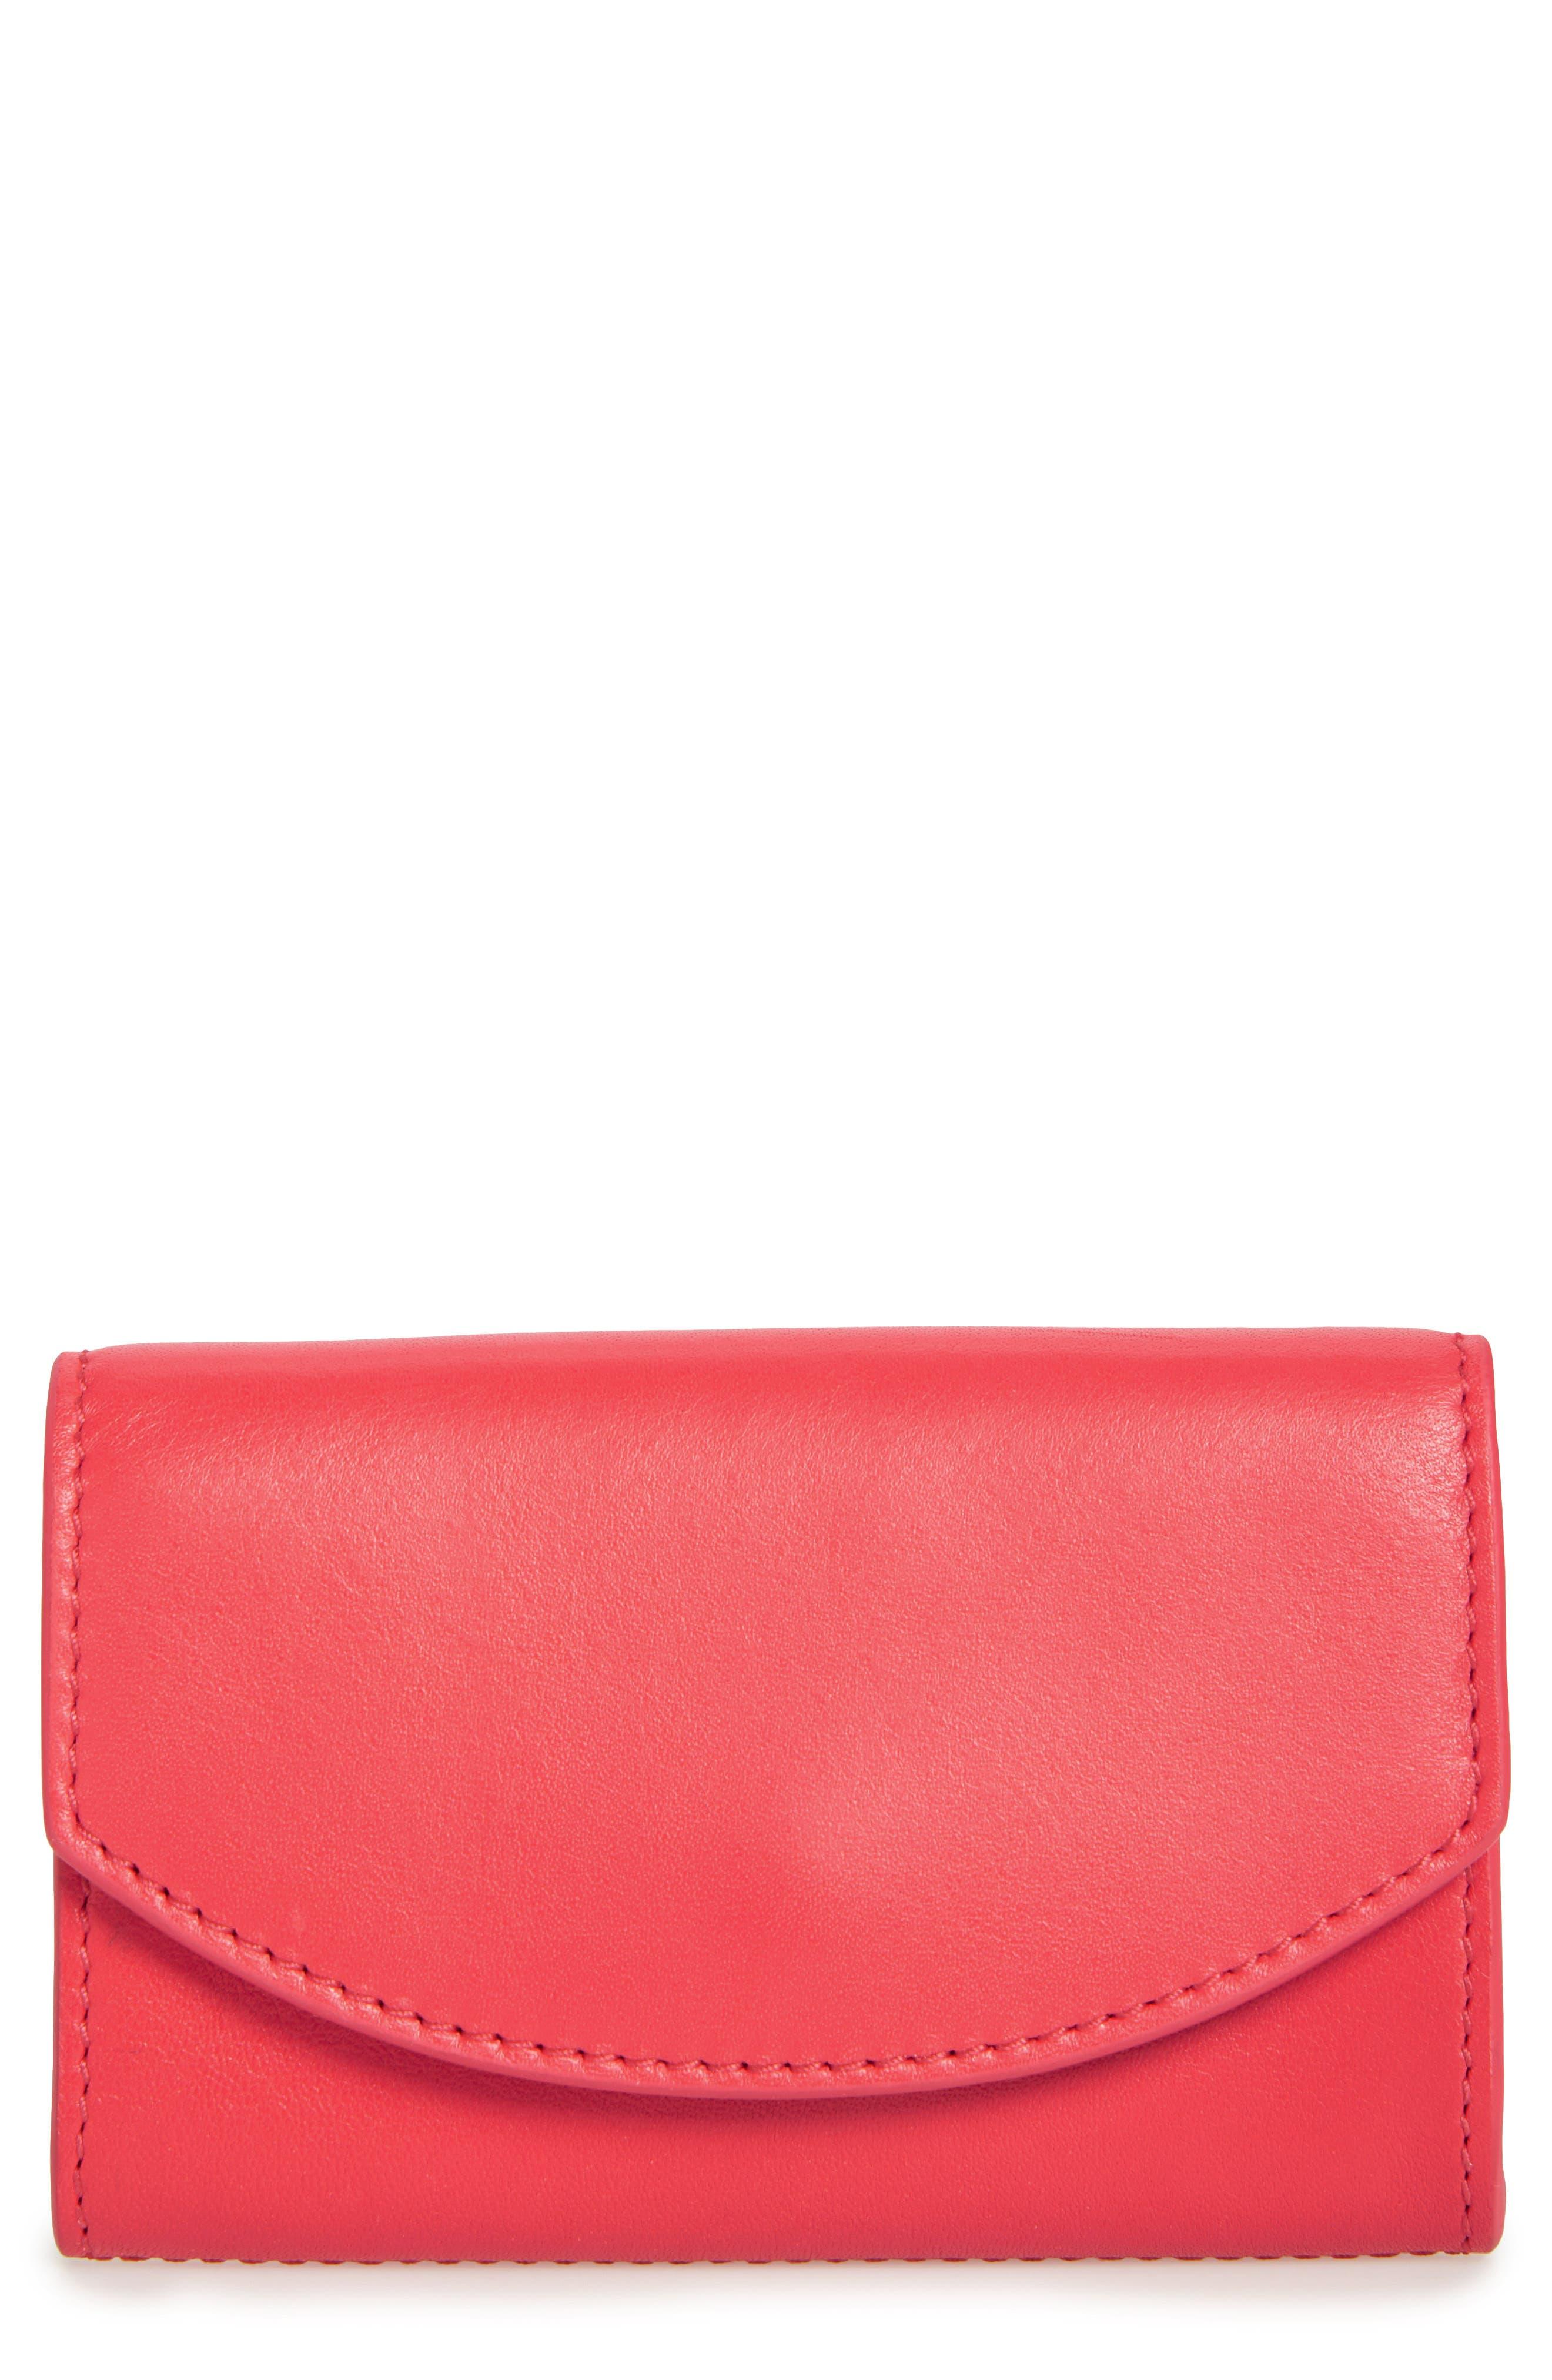 Main Image - Skagen Leather Card Case